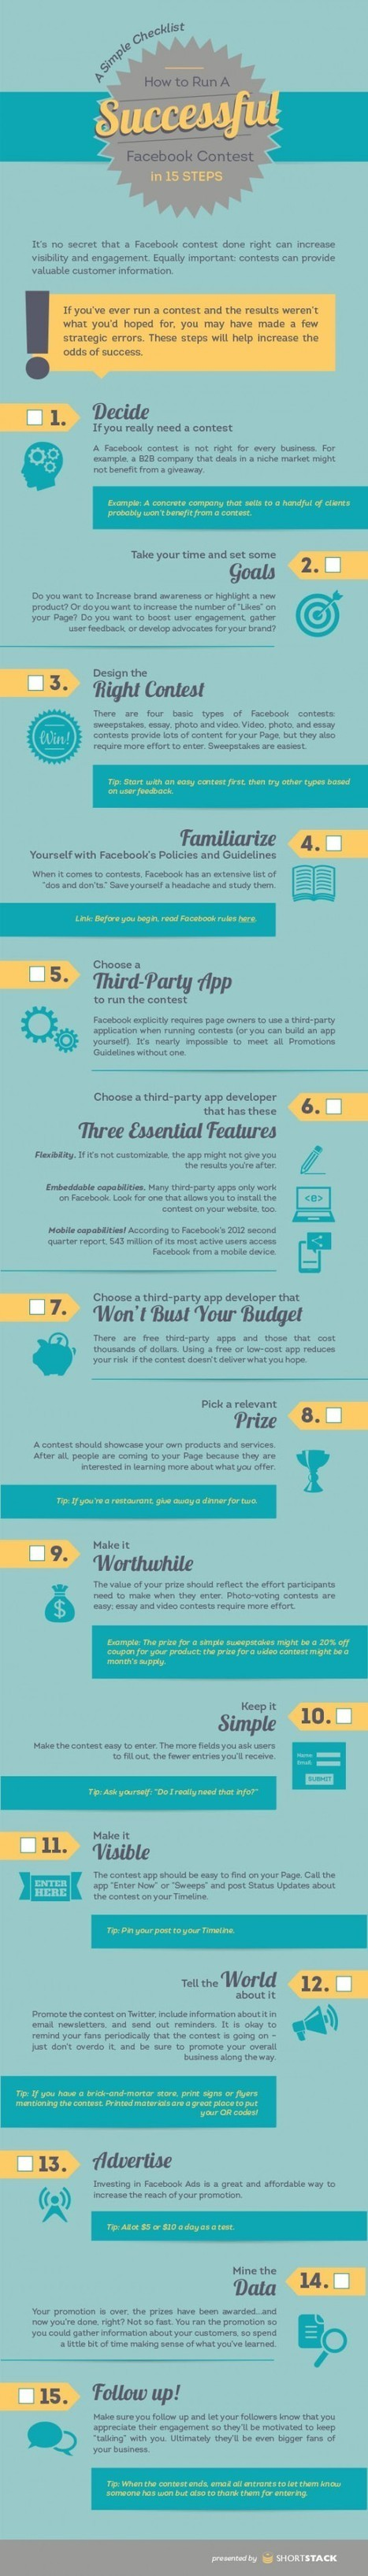 Comment lancer un concours Facebook? [Infographie] - Emarketinglicious   Social media   Scoop.it